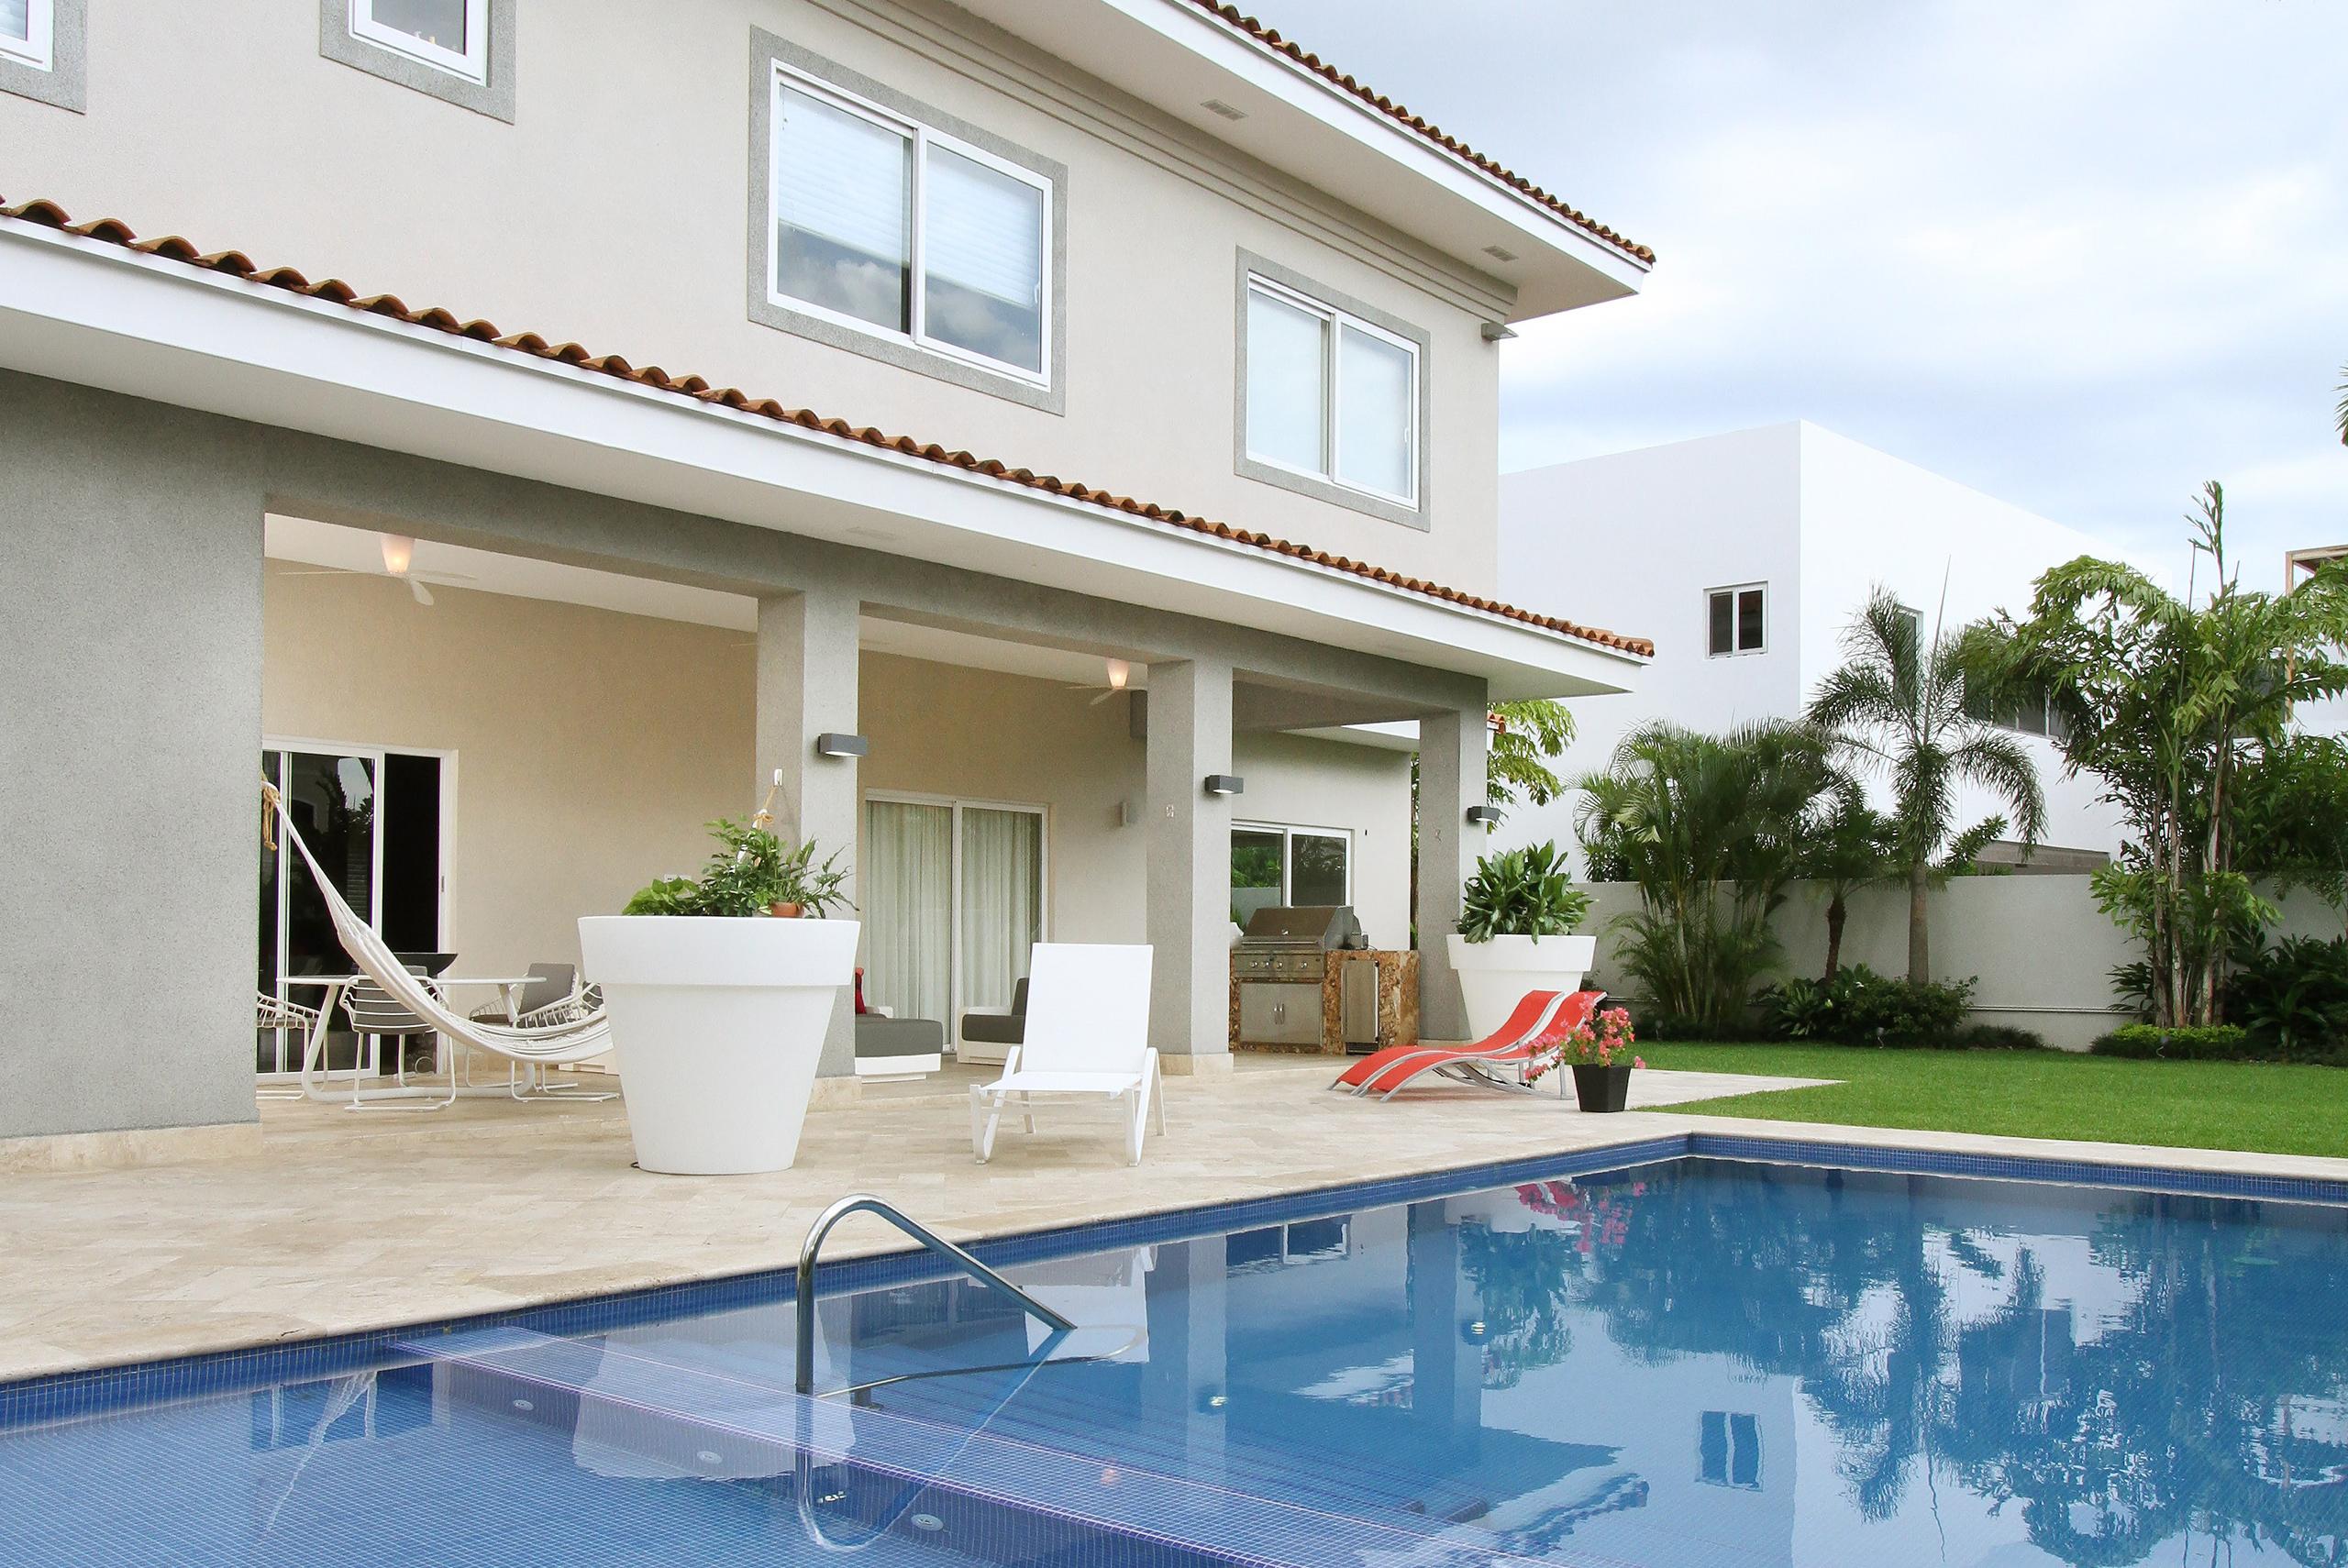 Panama, Republic of Panama – Renovation of a Private Villa - Oikos